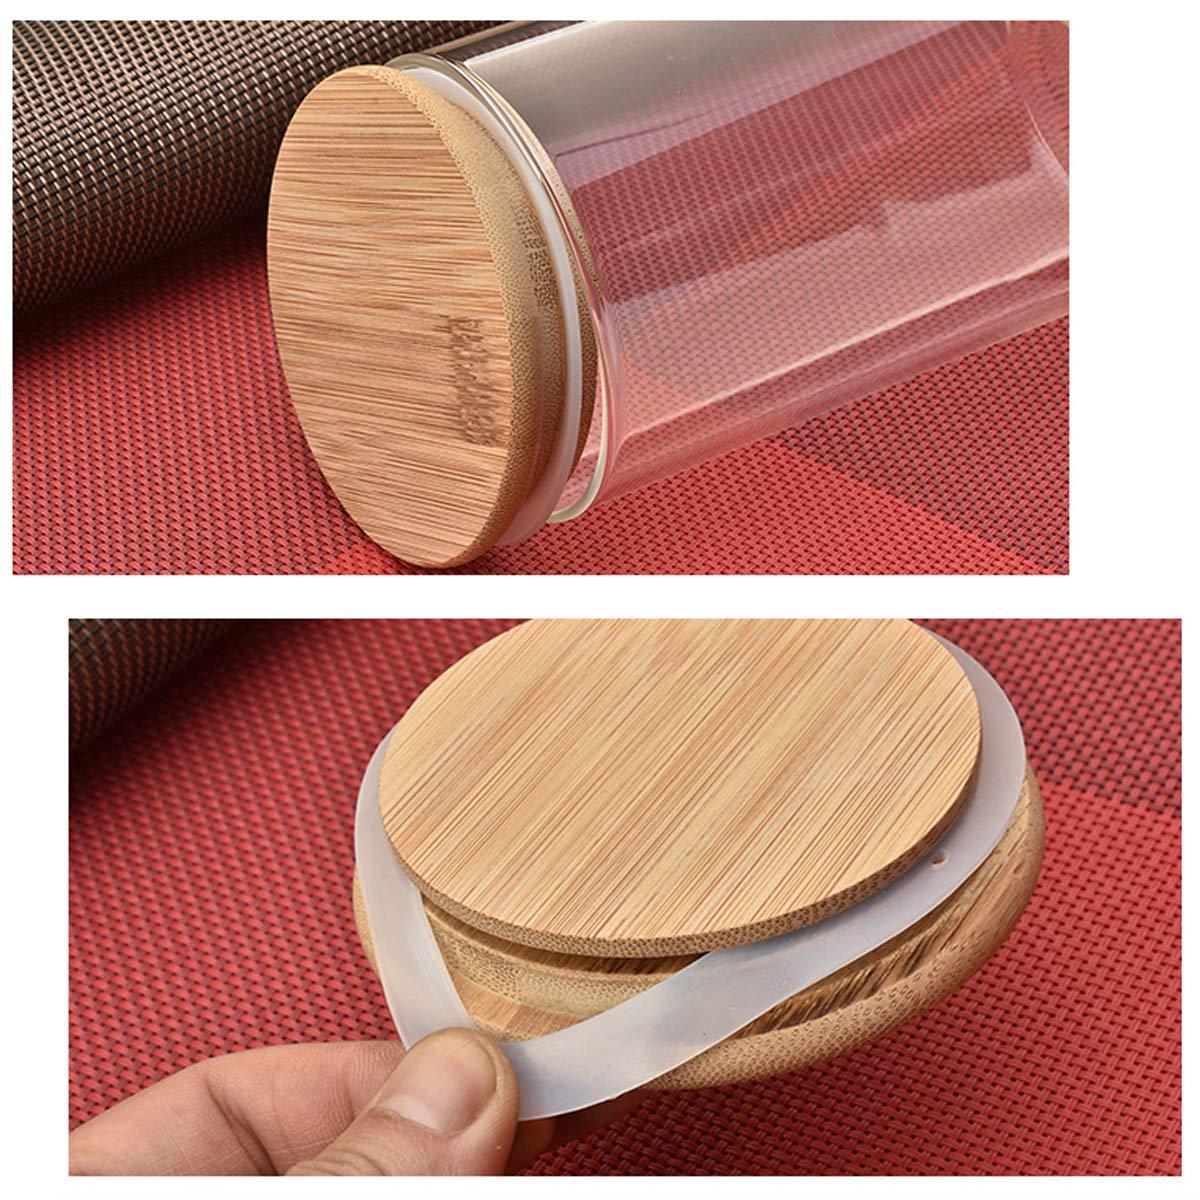 Kit 3 Potes De Vidro Tampa De Bambu Para Mantimentos 480ML